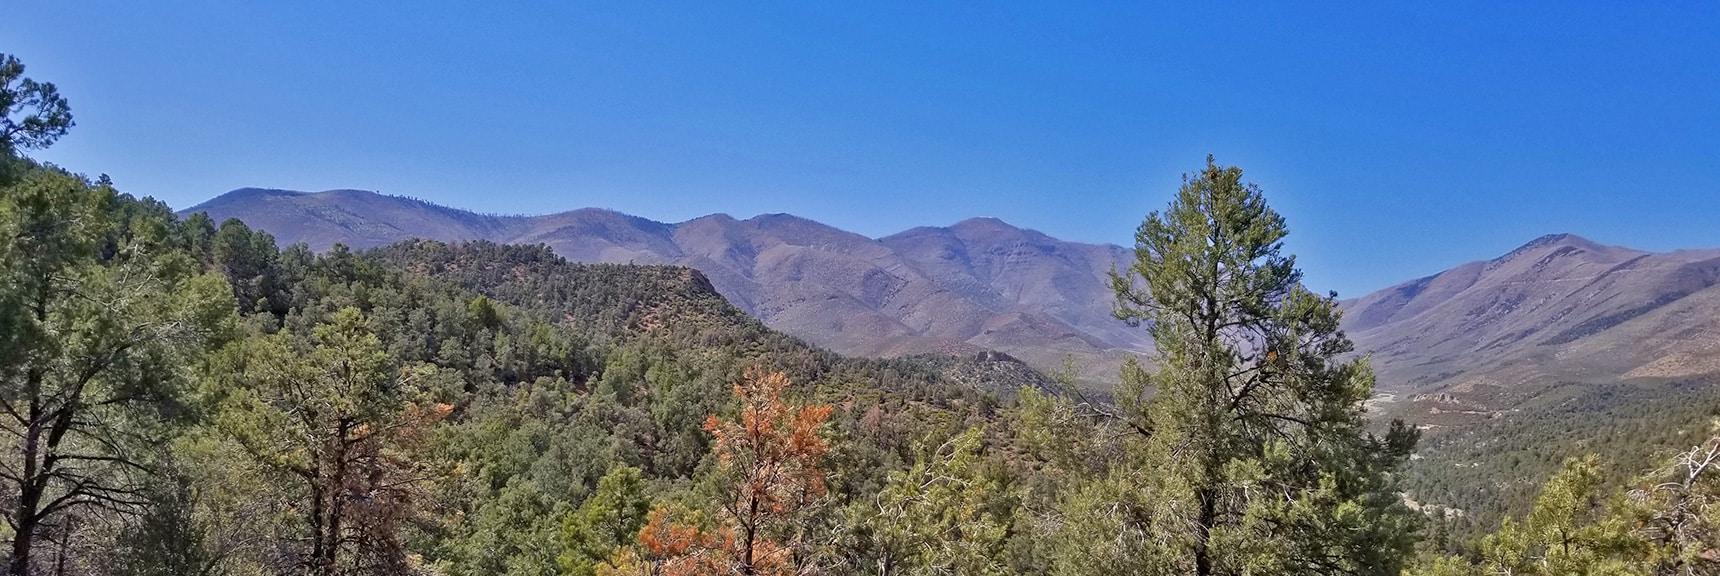 Sexton Ridgeline Leading to Griffith Peak | Griffith Peak Southern Approach from Sexton Ridge Above Lovell Canyon, Nevada